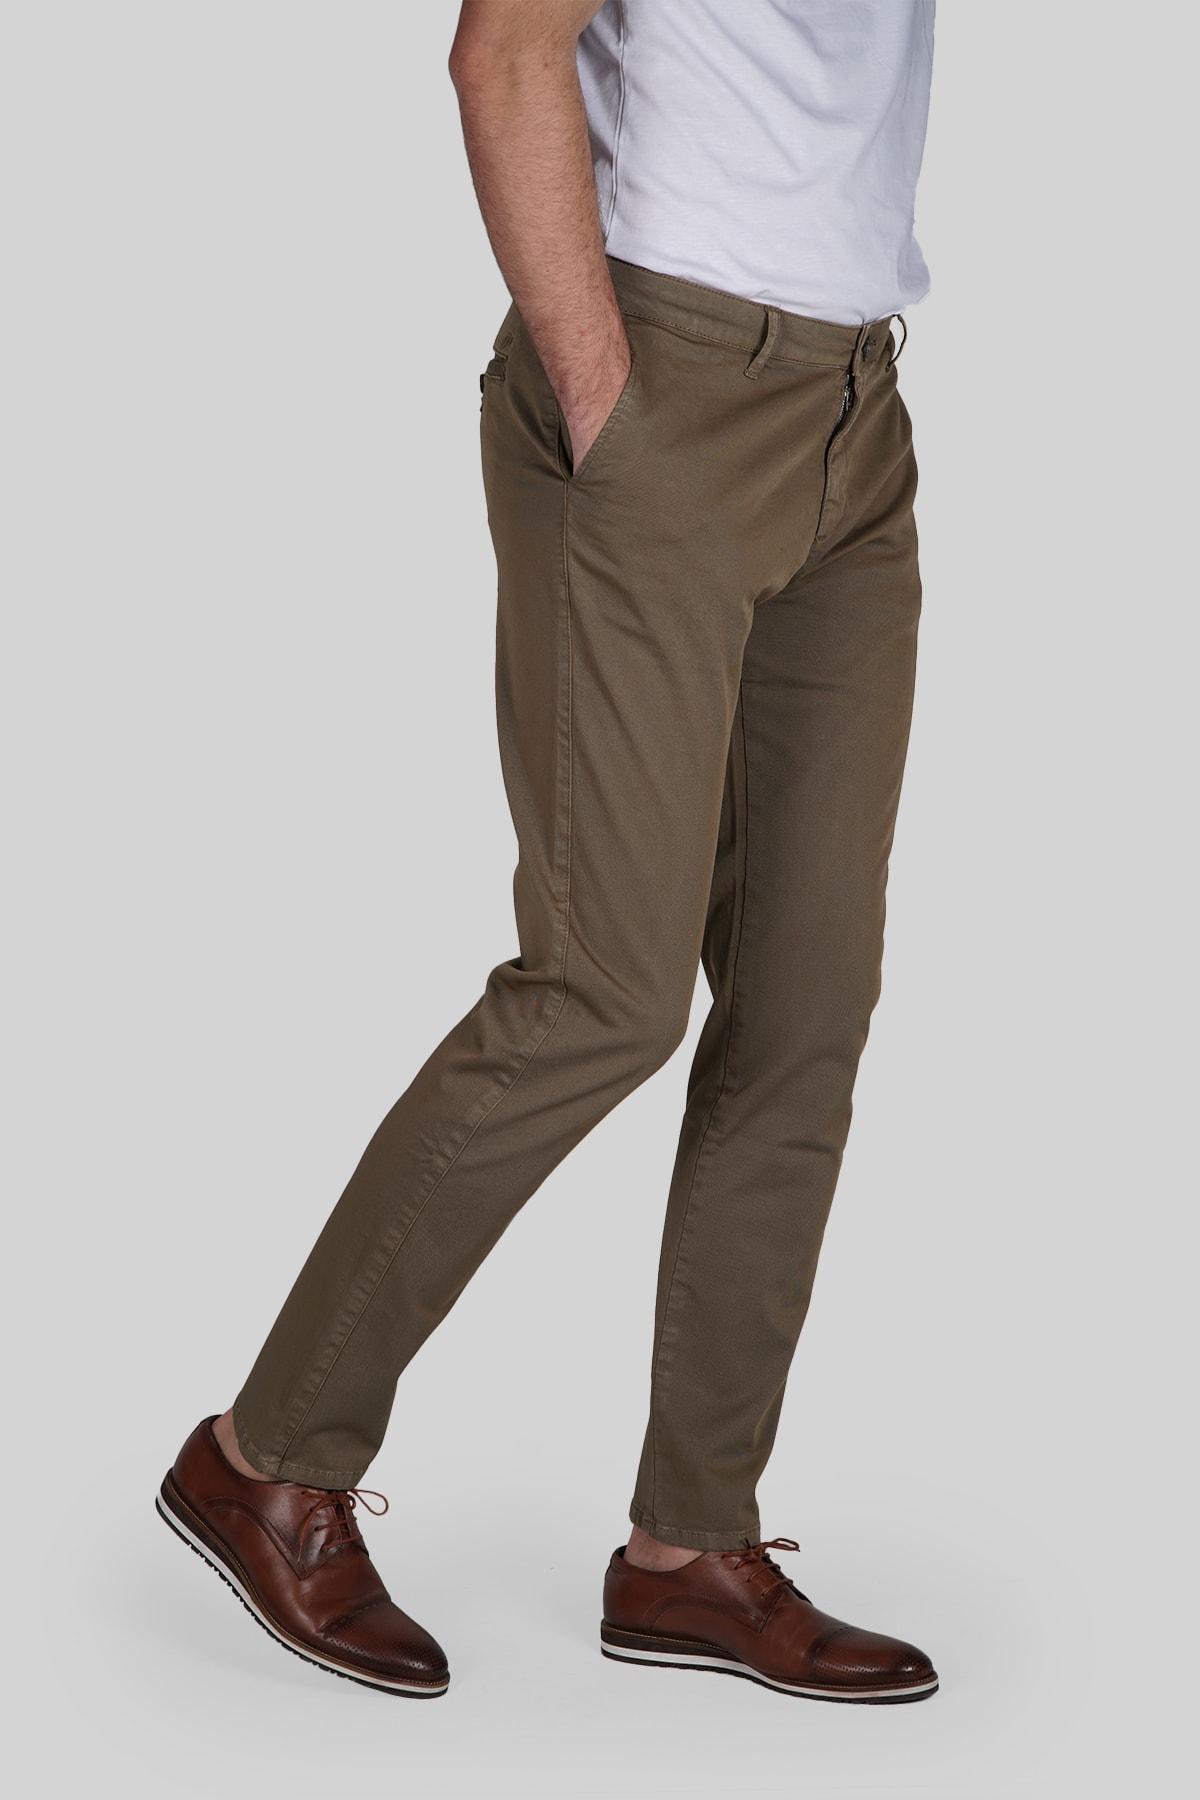 İgs Erkek Toprak Dynamic Pantolon 2